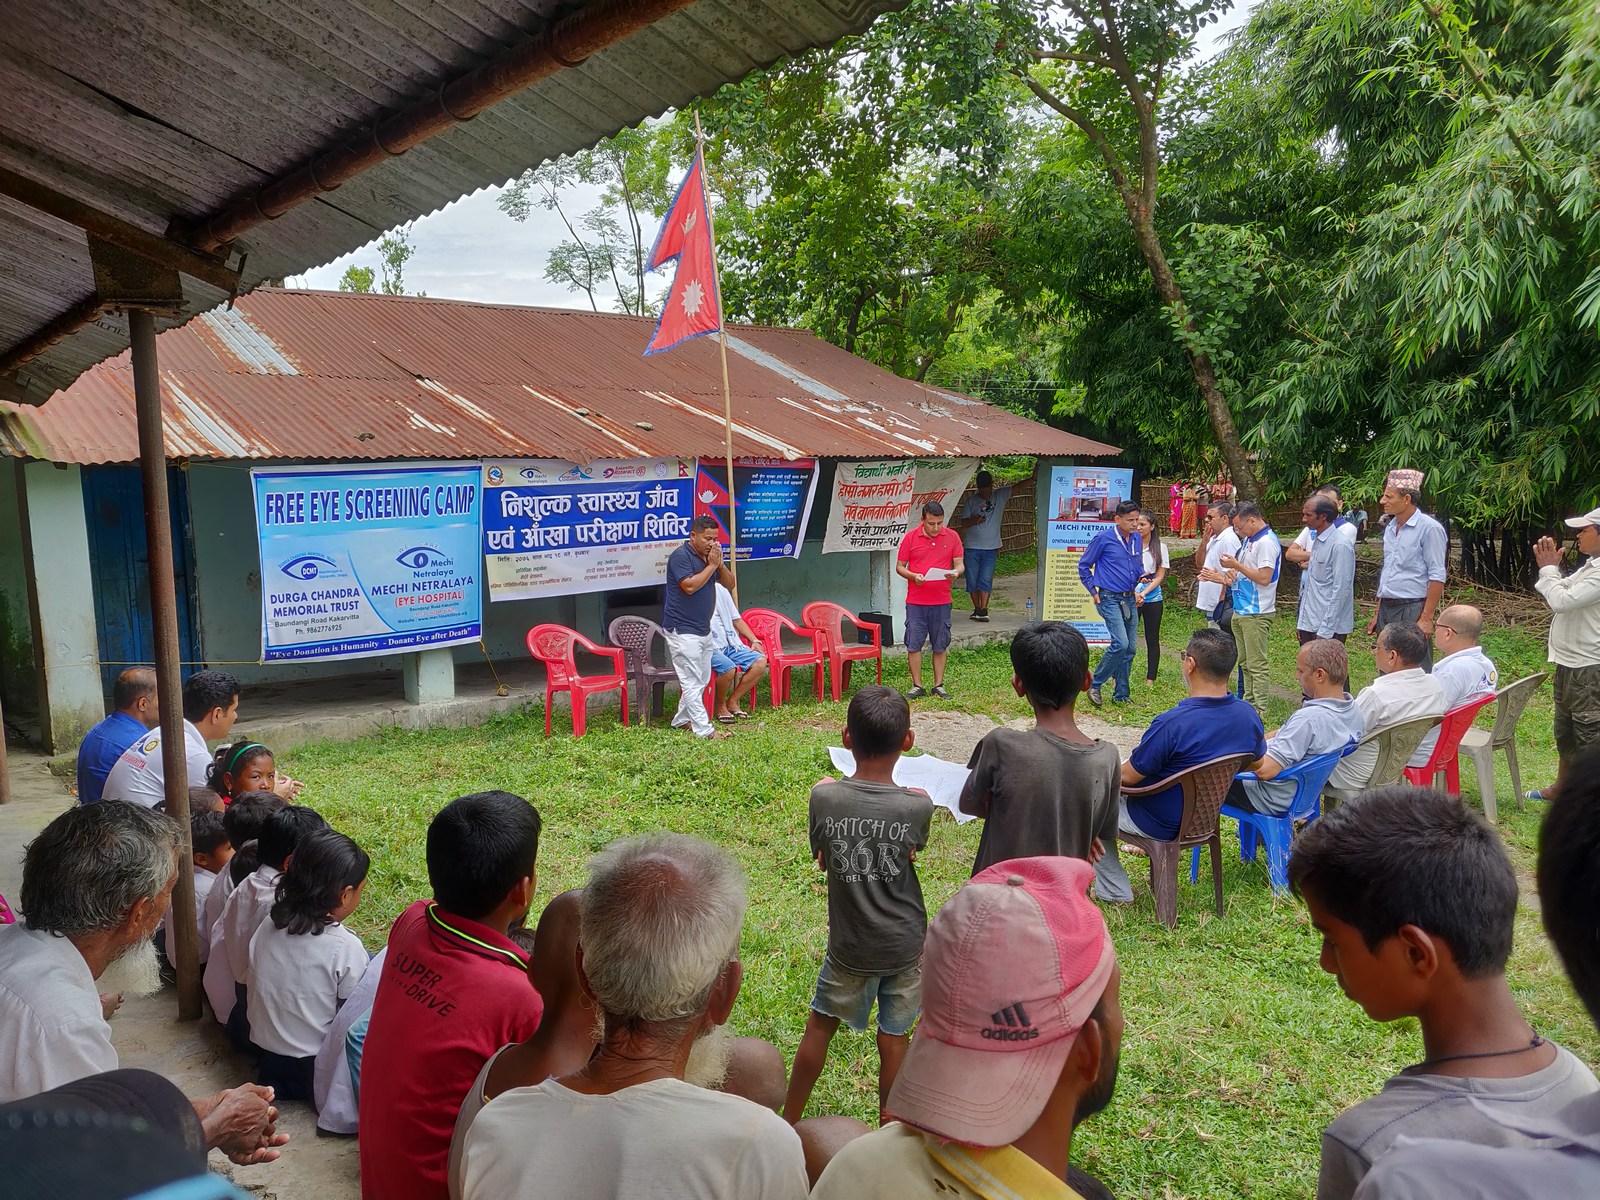 Free-Health-Camp-Eye-Screening-at-Gwala-Basti-Mechinagar-15-Jhapa-Nepal-Rotary-Club-of-Kakarvitta-14